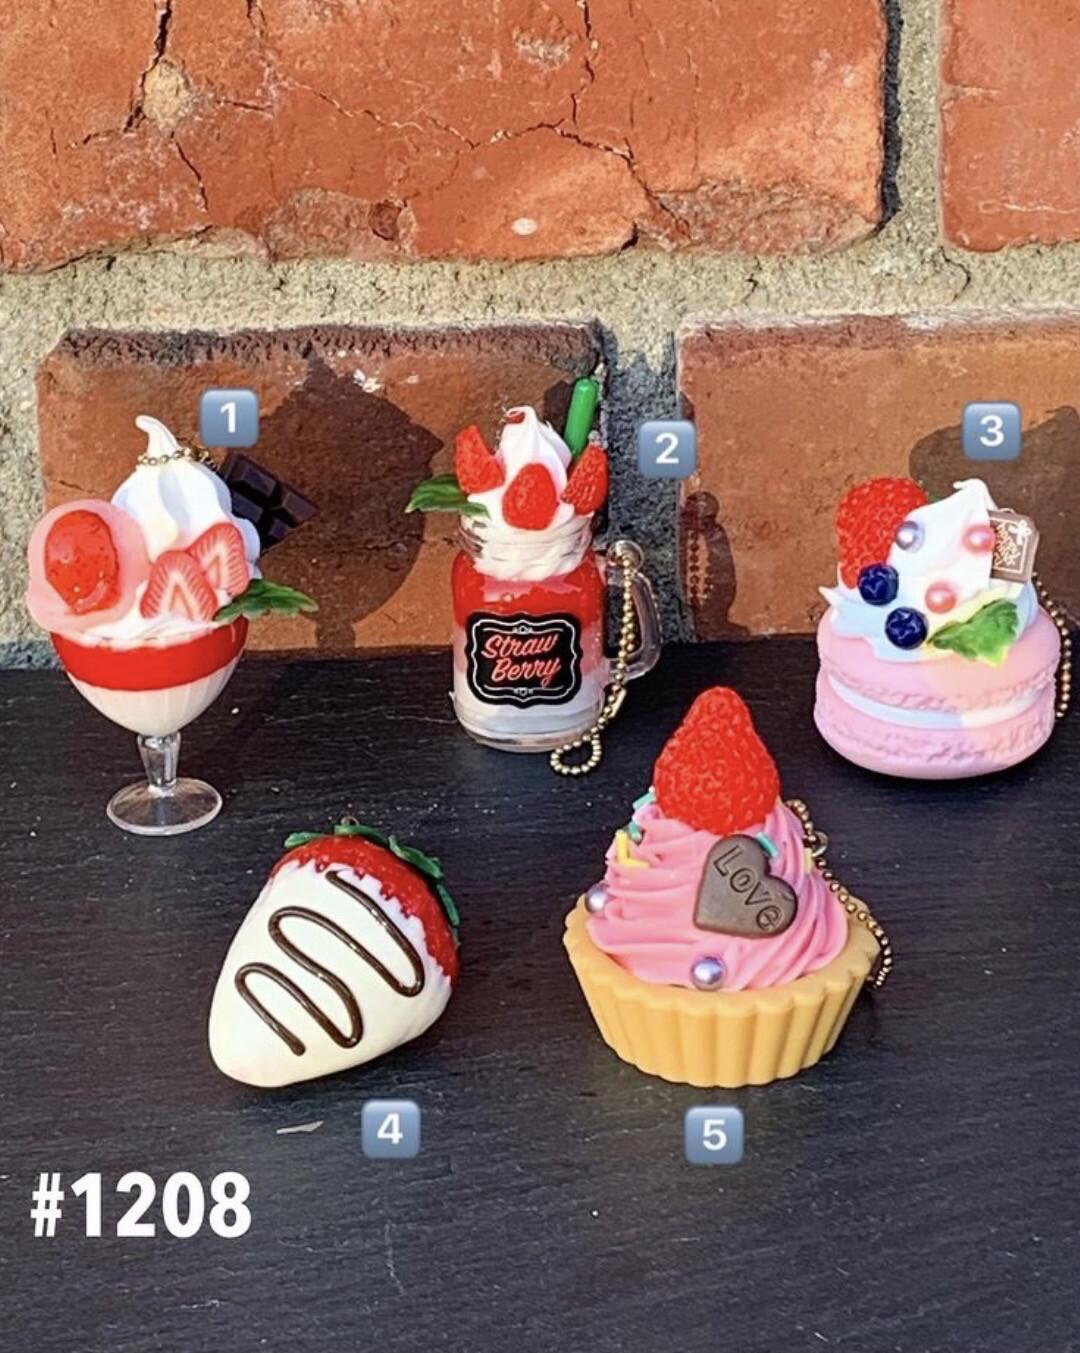 J. Dream Strawberry Mascot Miniature